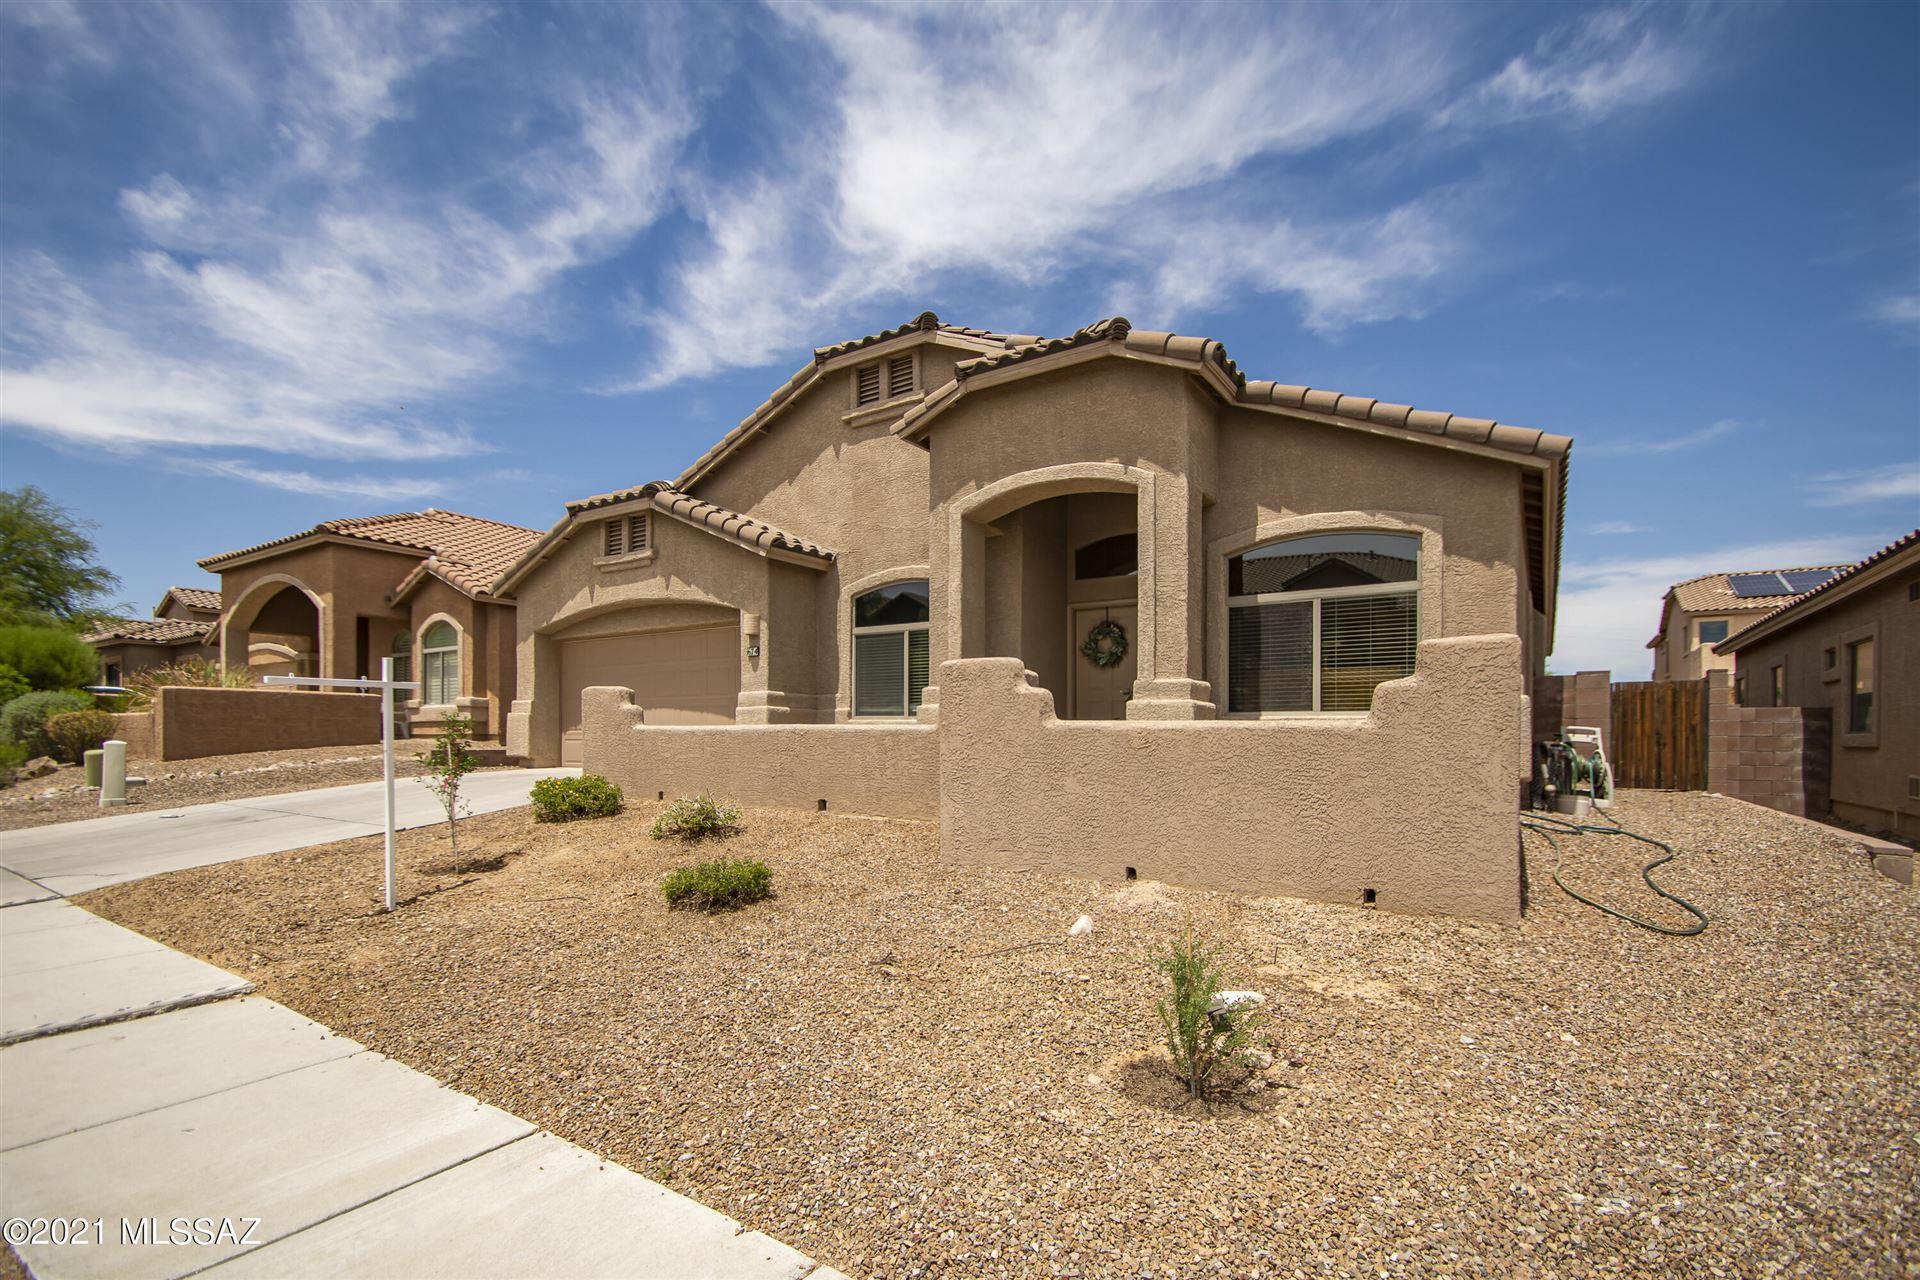 674 W Adagio Lane, Oro Valley, AZ 85737 - MLS#: 22111939